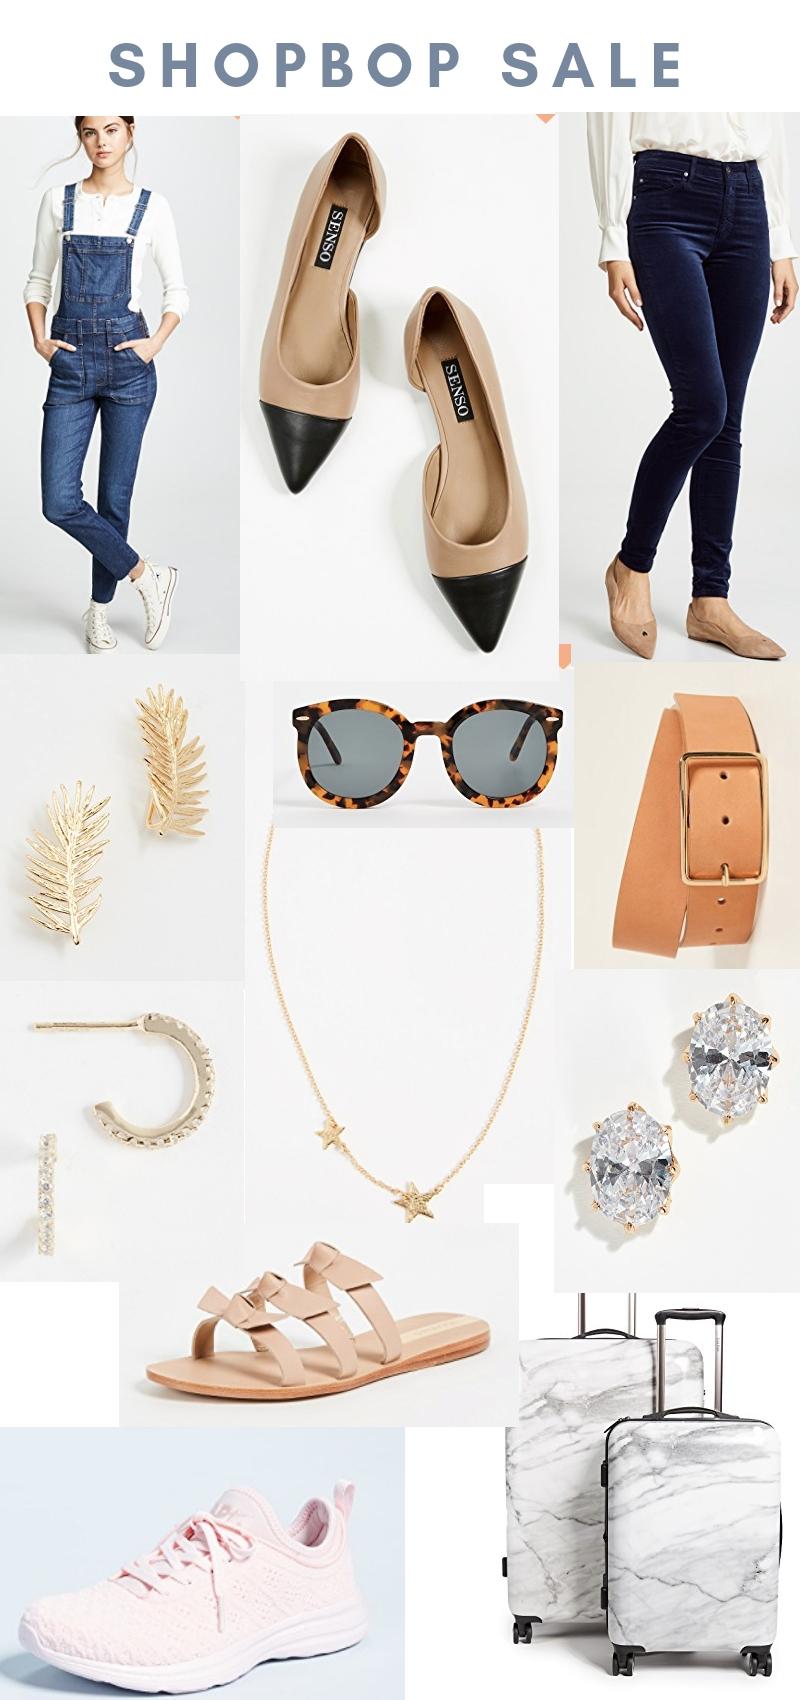 875a01aa44f shopbop fall sale 2018 2 - Veronika s Blushing